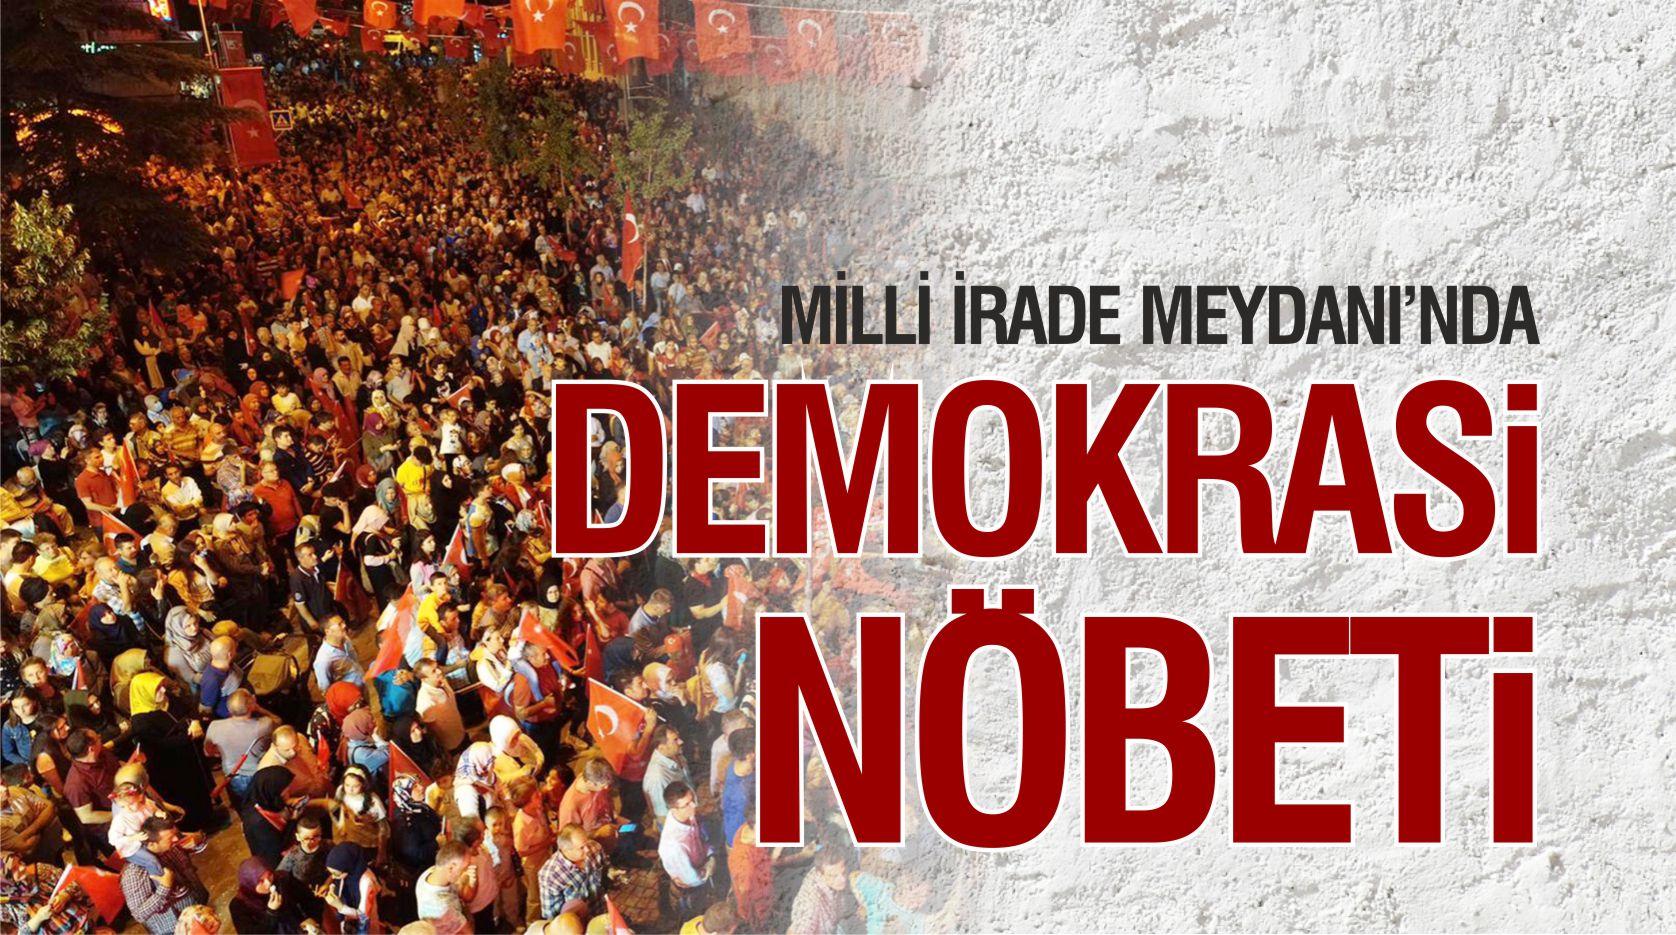 MİLLİ İRADE MEYDANI'NDA DEMOKRASİ NÖBETİ